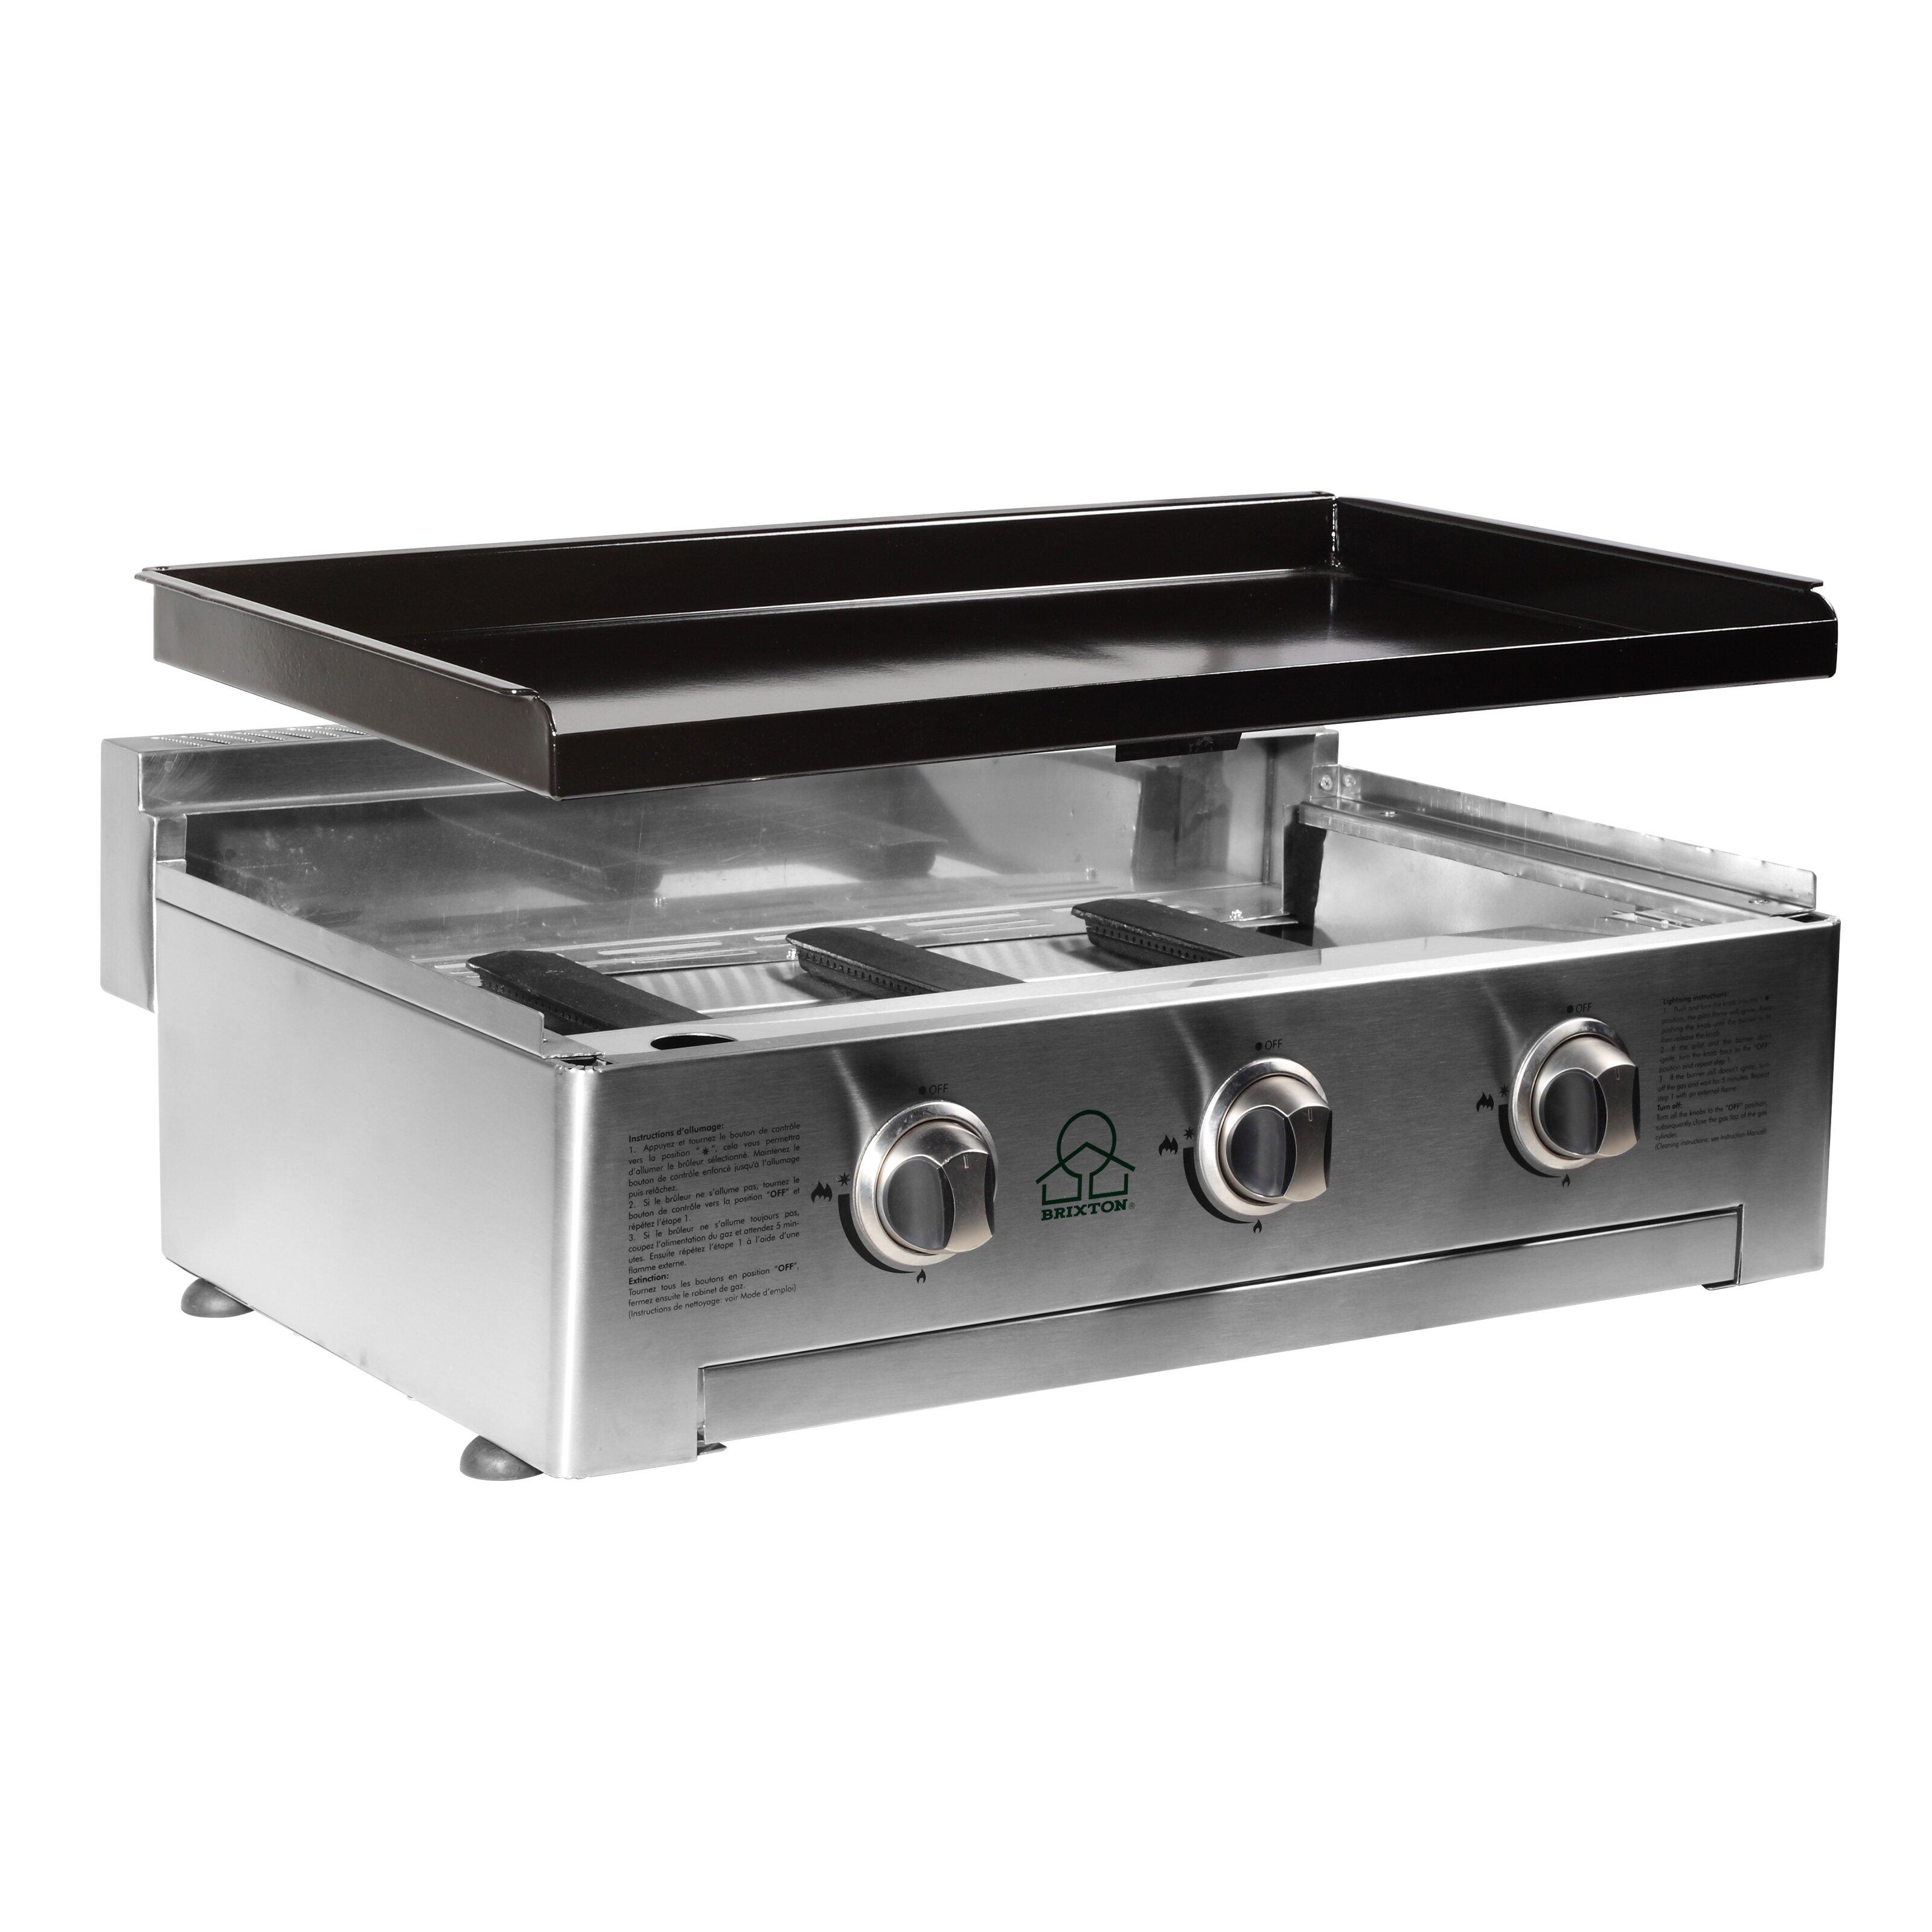 brixton 80cm 3 burner plancha gas barbecue reviews. Black Bedroom Furniture Sets. Home Design Ideas